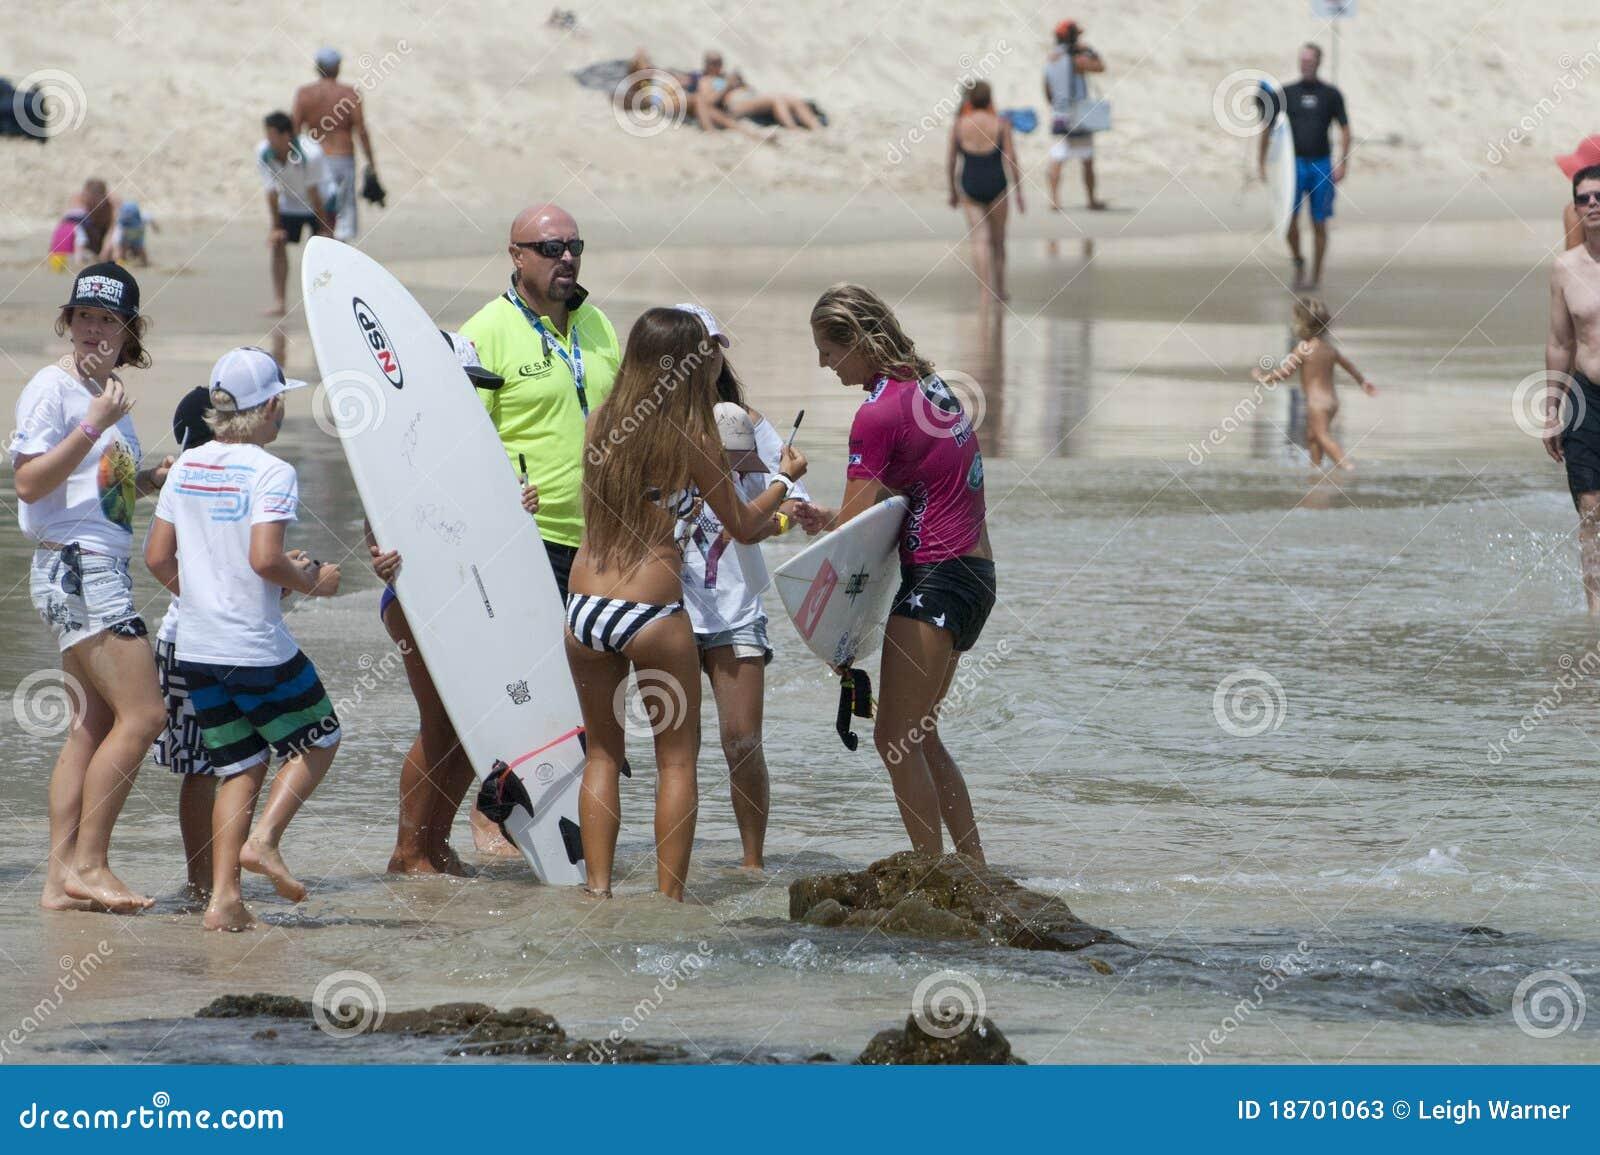 Mentawai Islands Regency Surfing Wind Wave Surfboard Bodyboarding PNG,  Clipart, Athlete, Boardsport, Bodyboarding, Dane Reynolds, Extreme